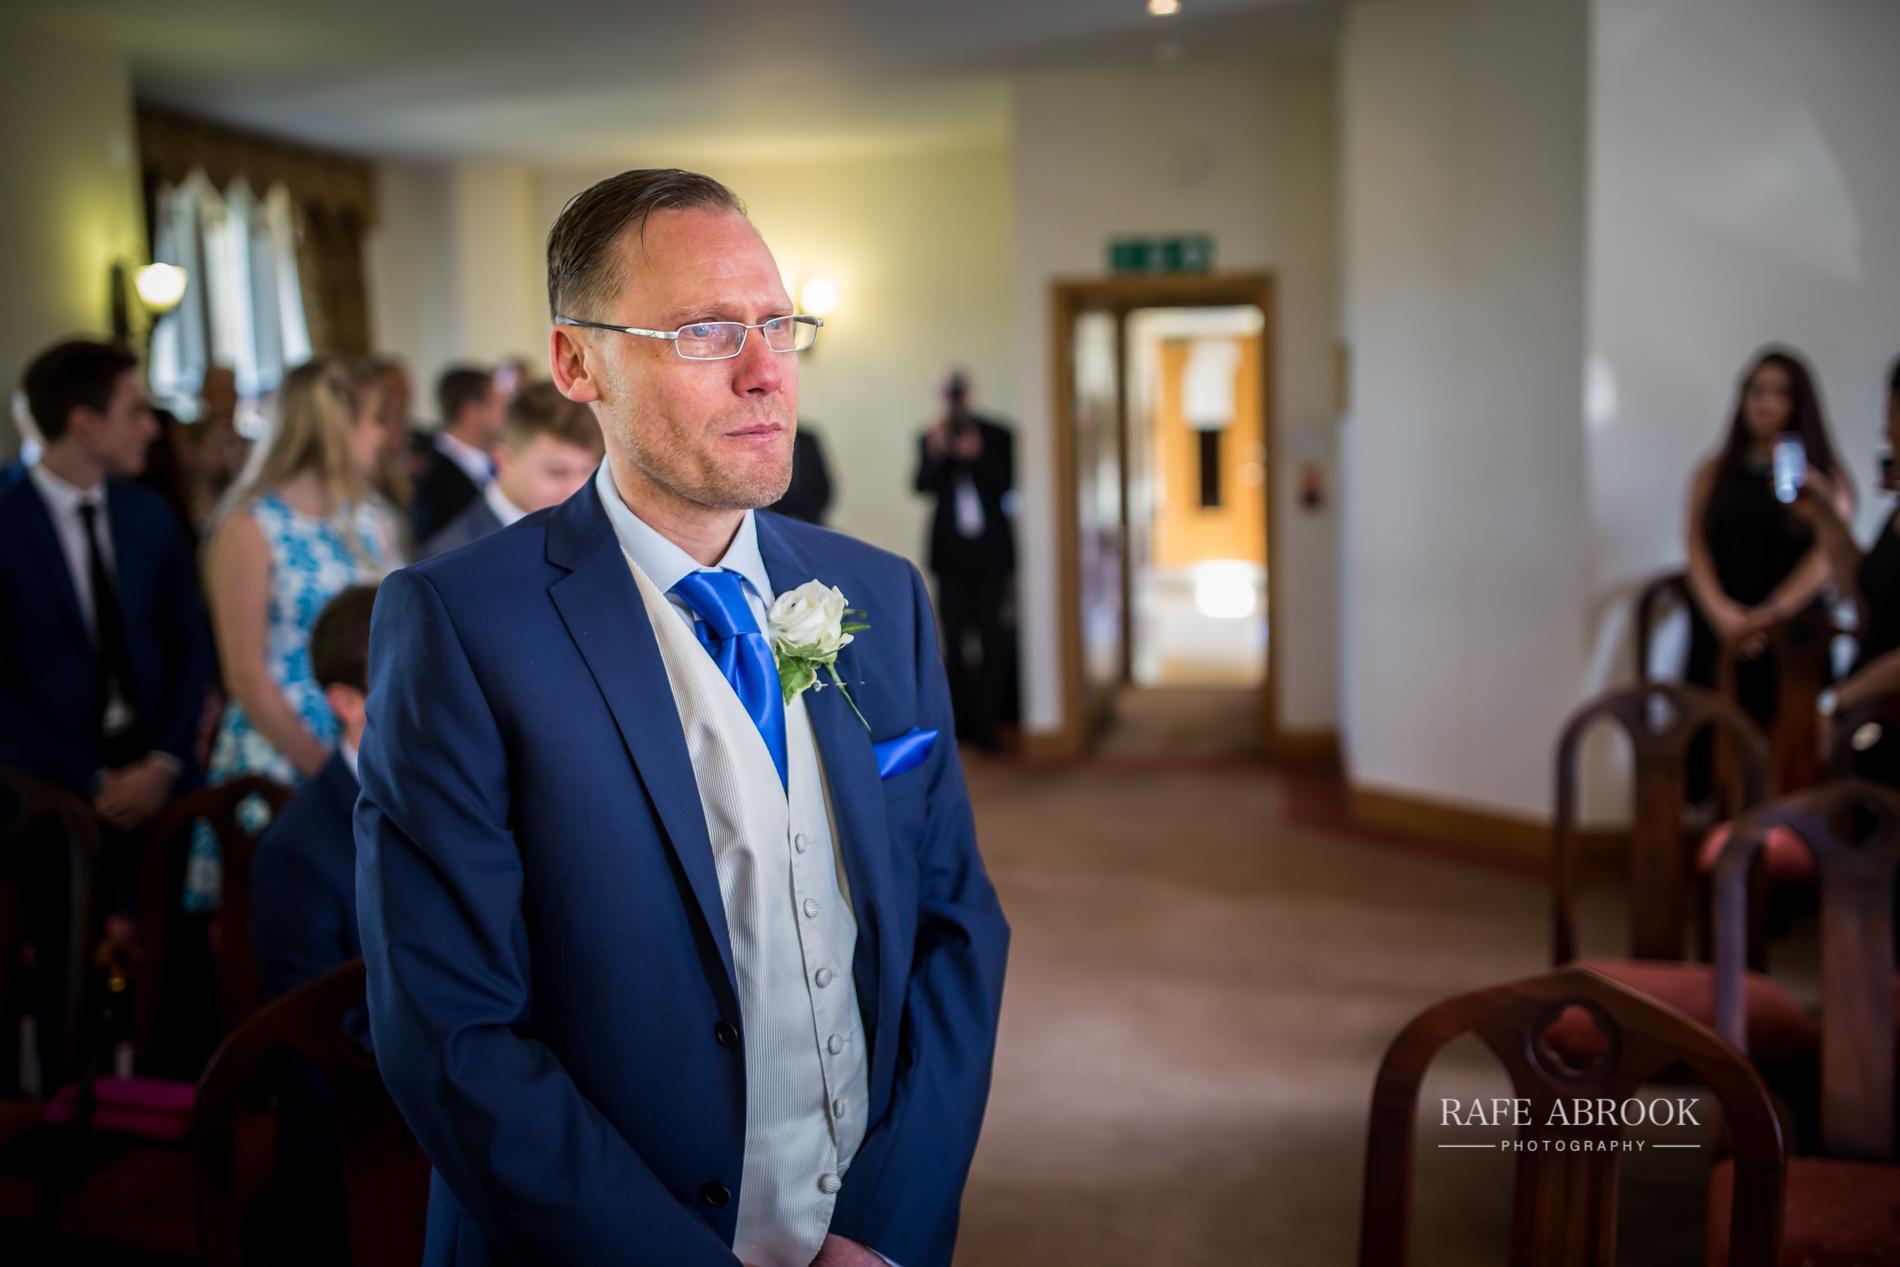 agnes & laurence wedding kings lodge hotel kings langley hertfordshire-1103.jpg